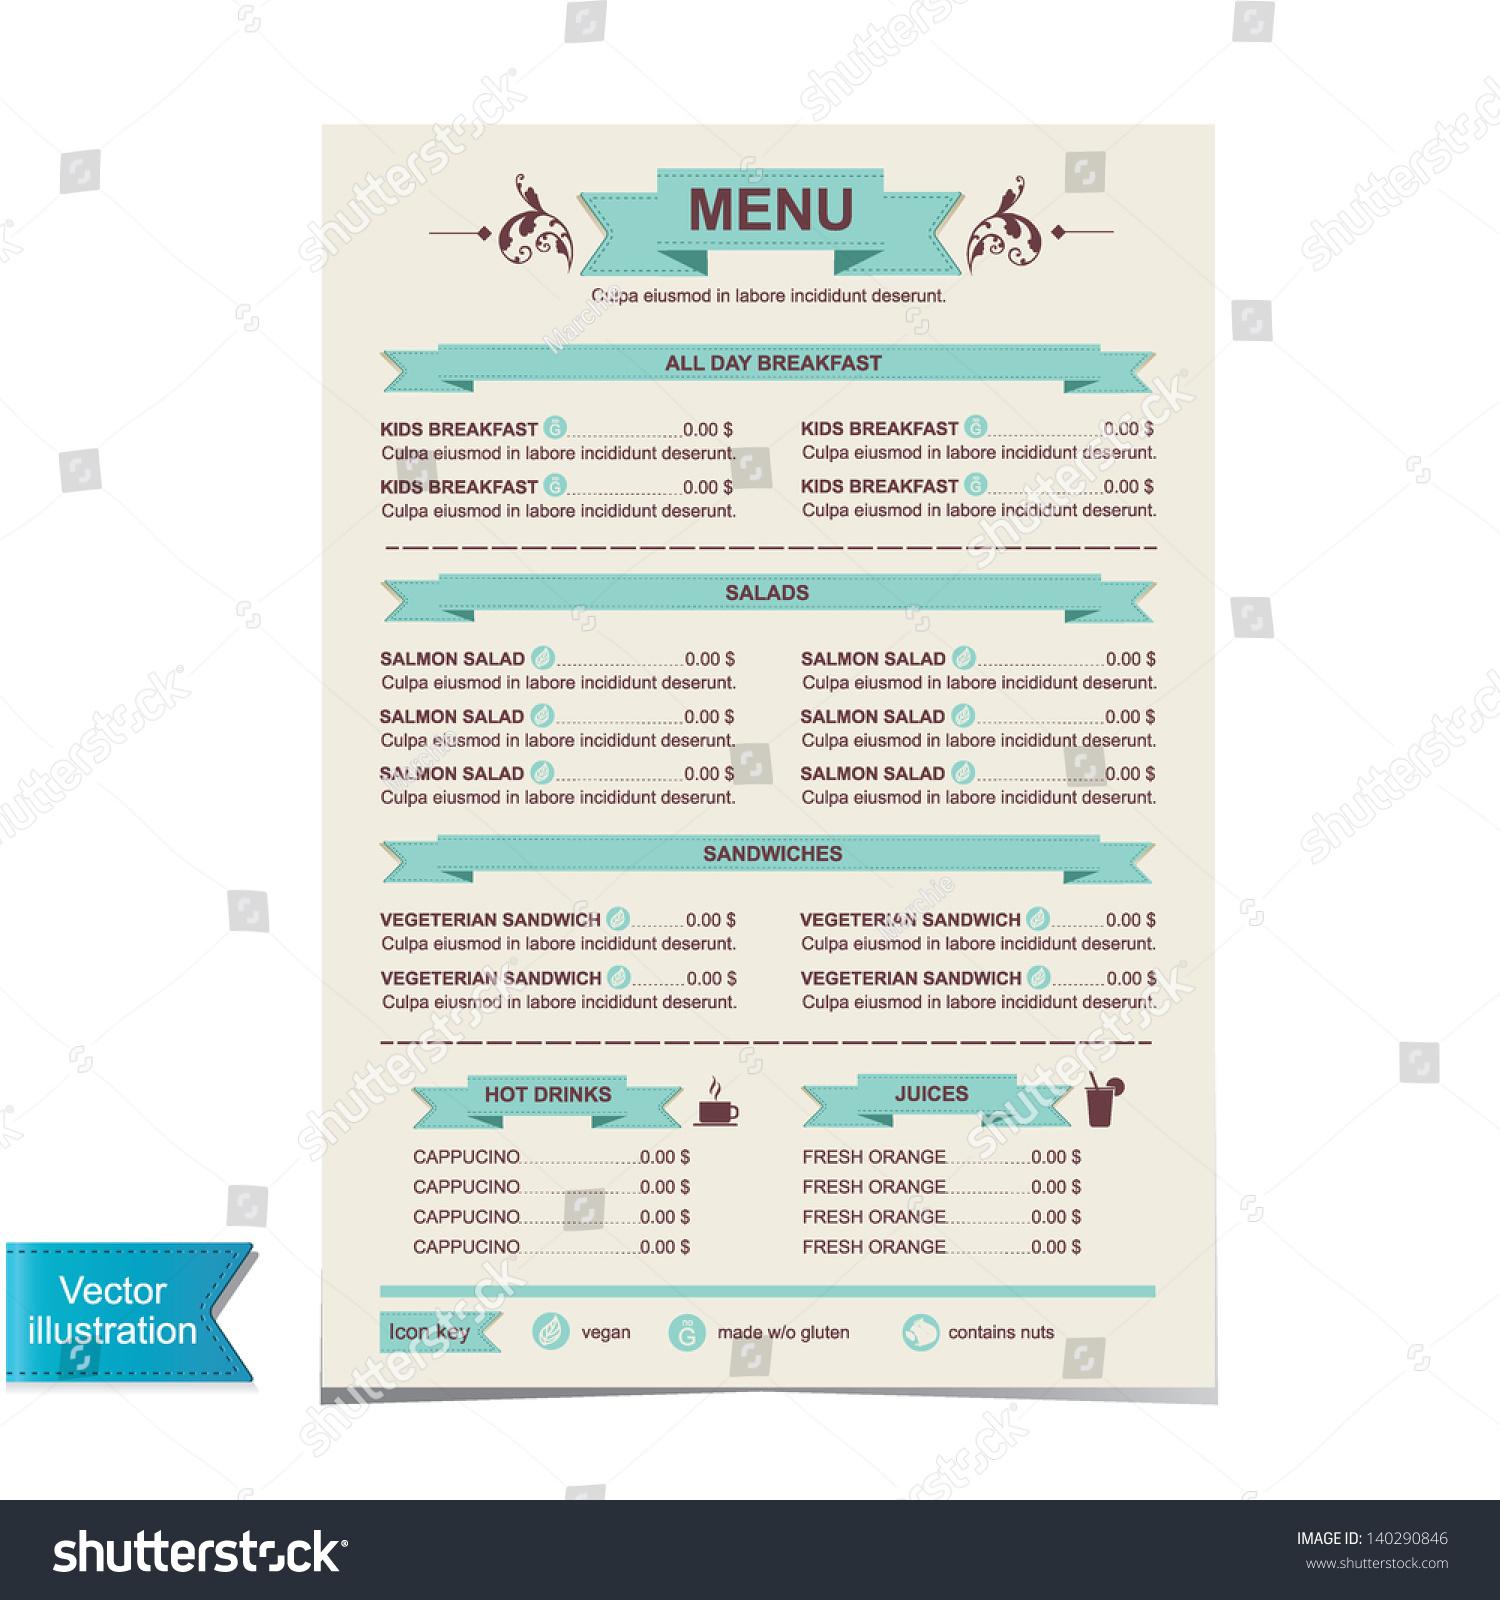 Cafe Menu Template Designvector Illustration Vector – Cafe Menu Template